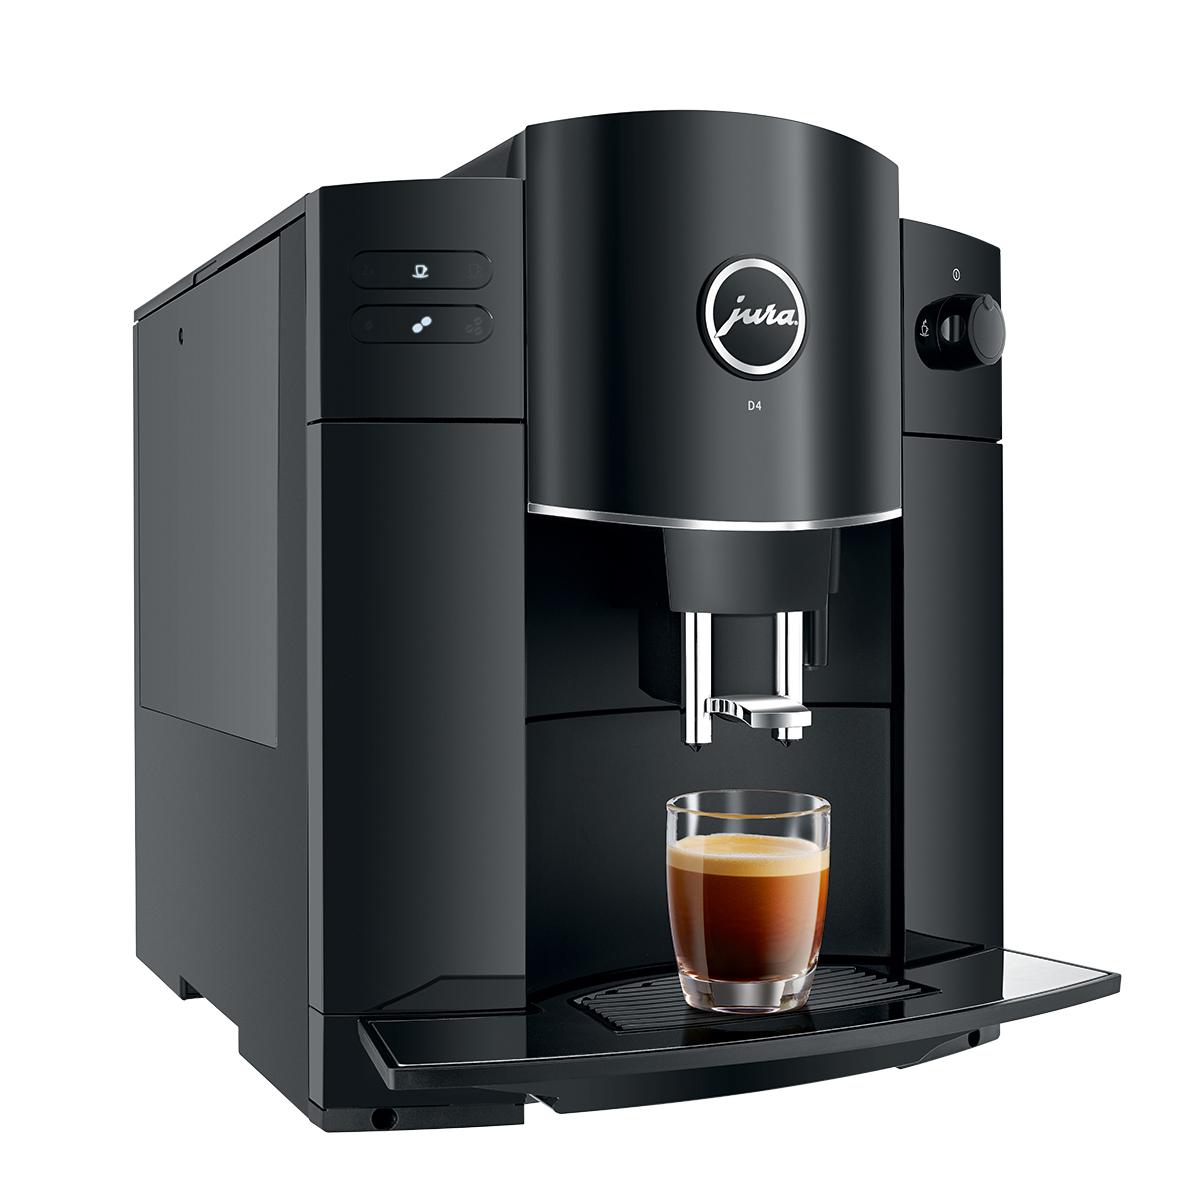 Espressor automat Jura D4, 15 bari, 1.9 l, 200g, rasnita AromaG2, afisaj cu simboluri, negru